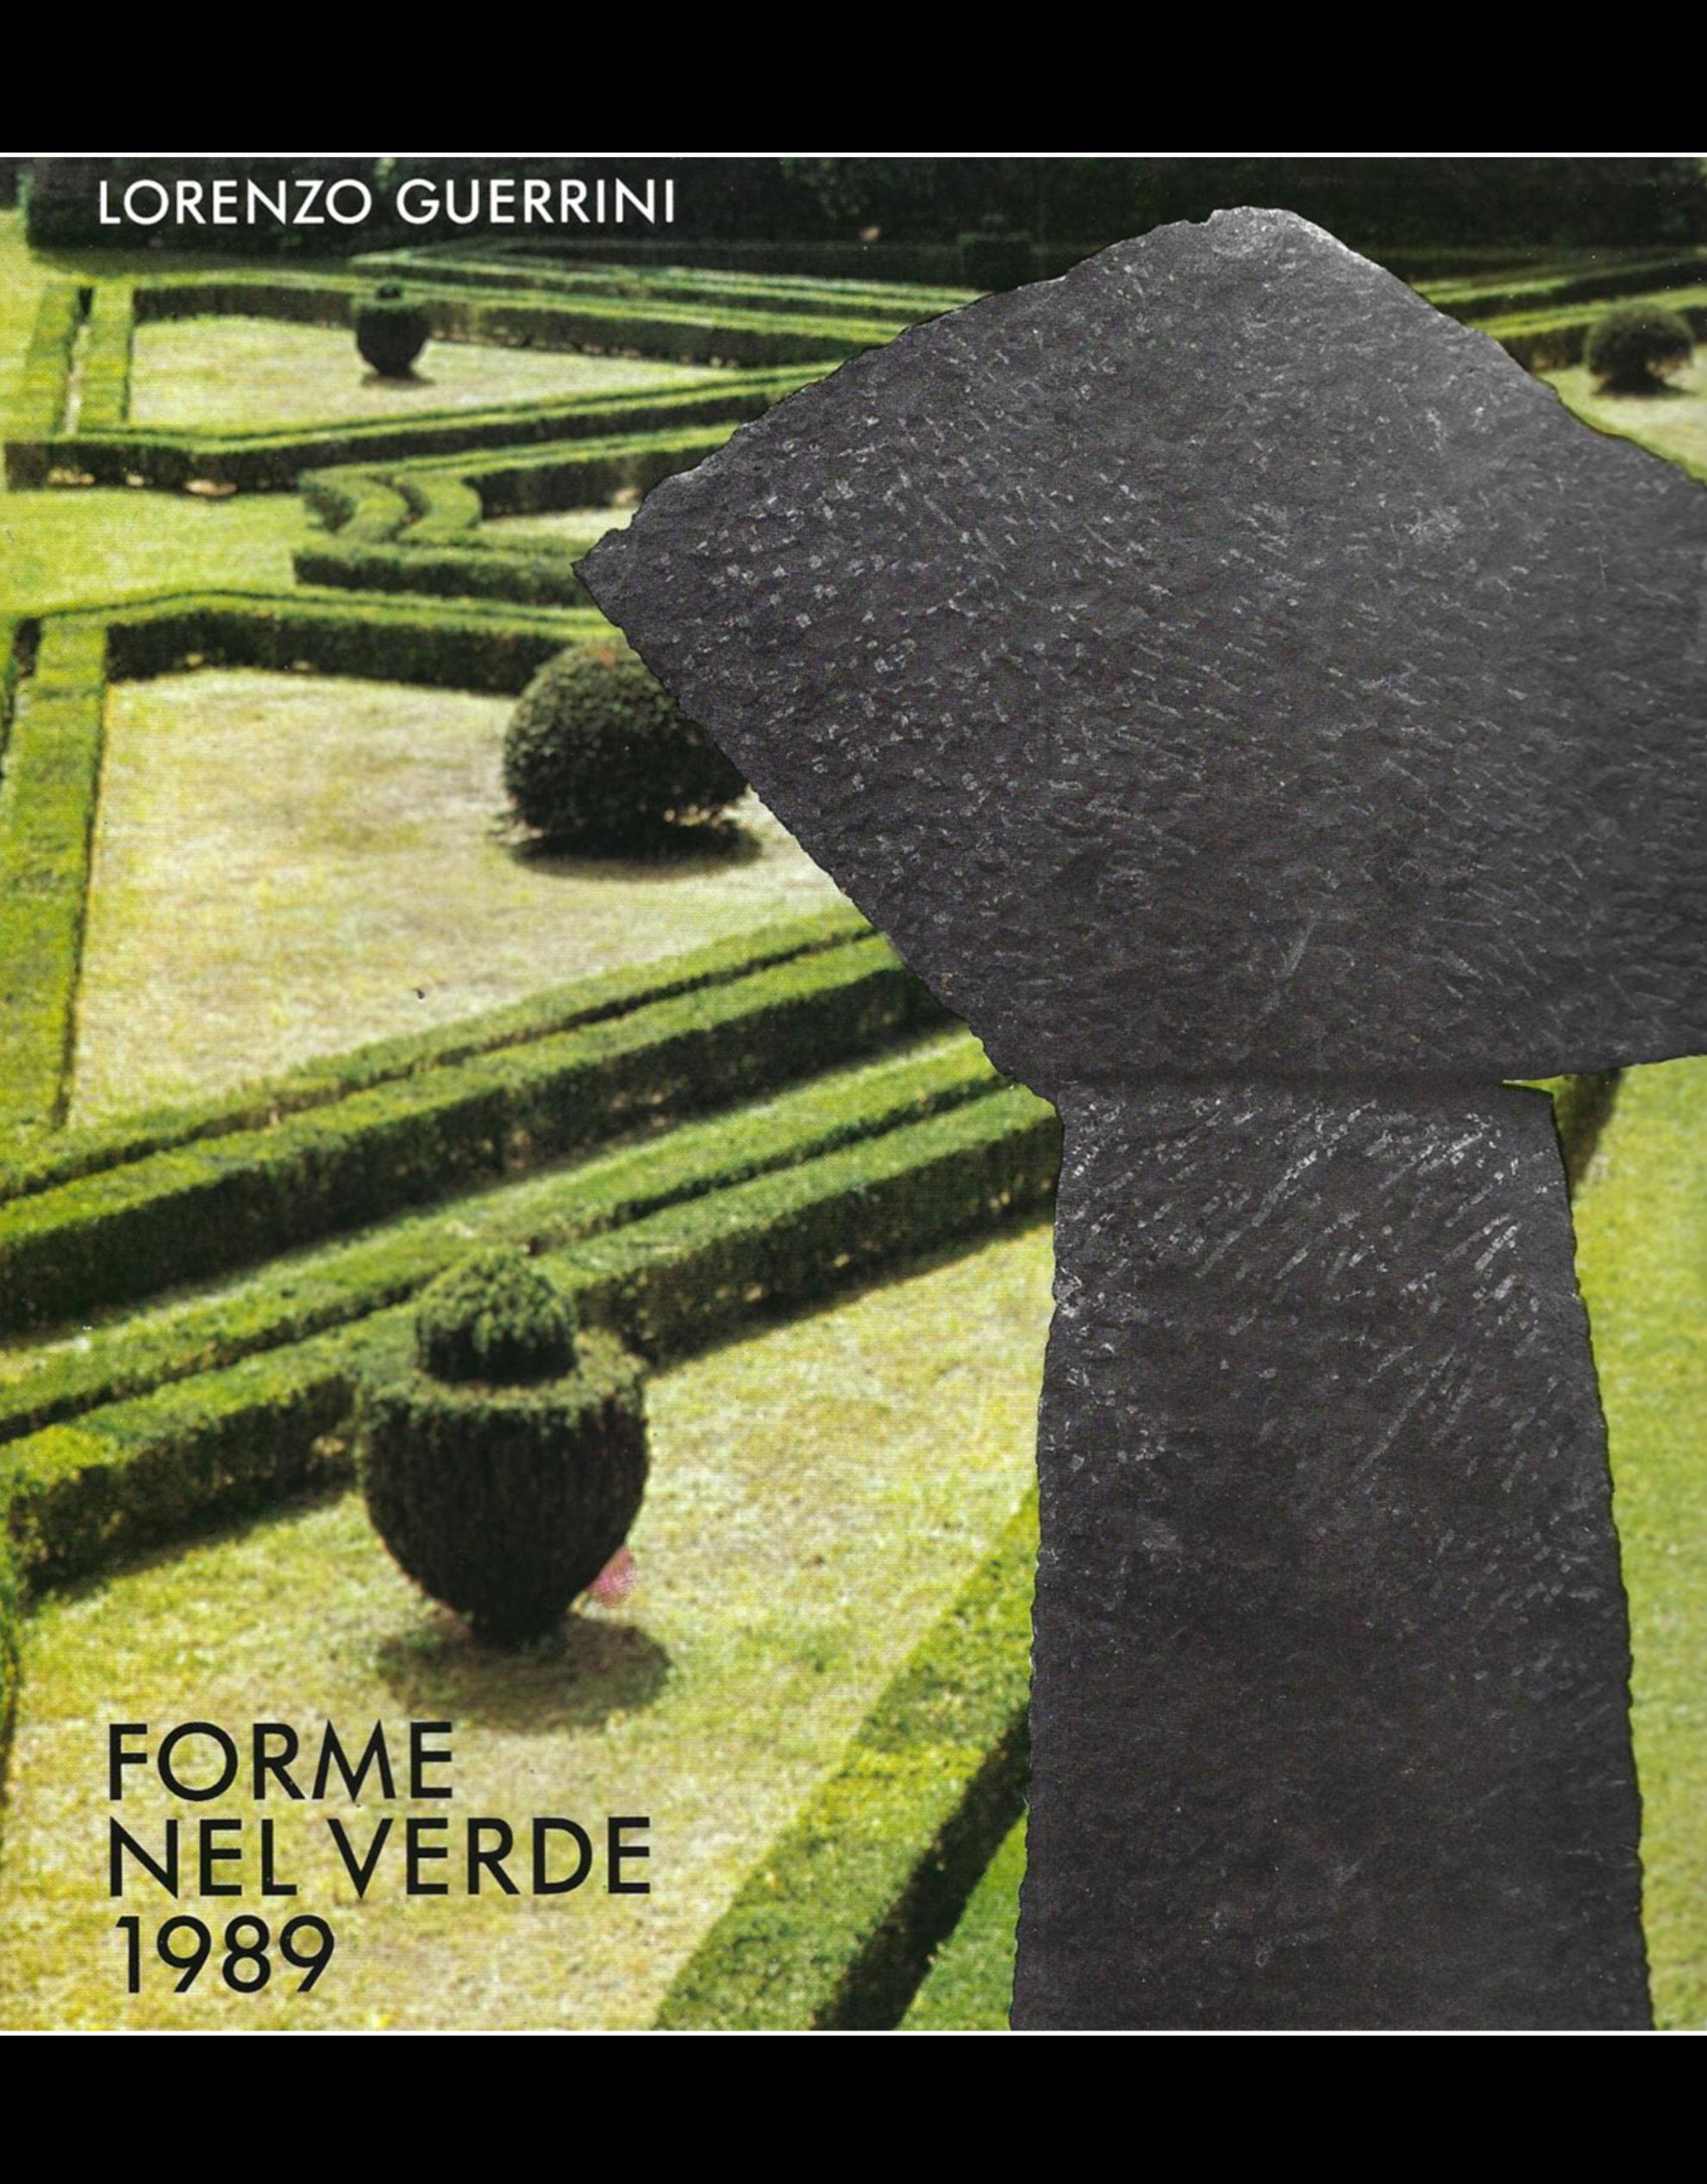 Catalogo Forme nel Verde 1989